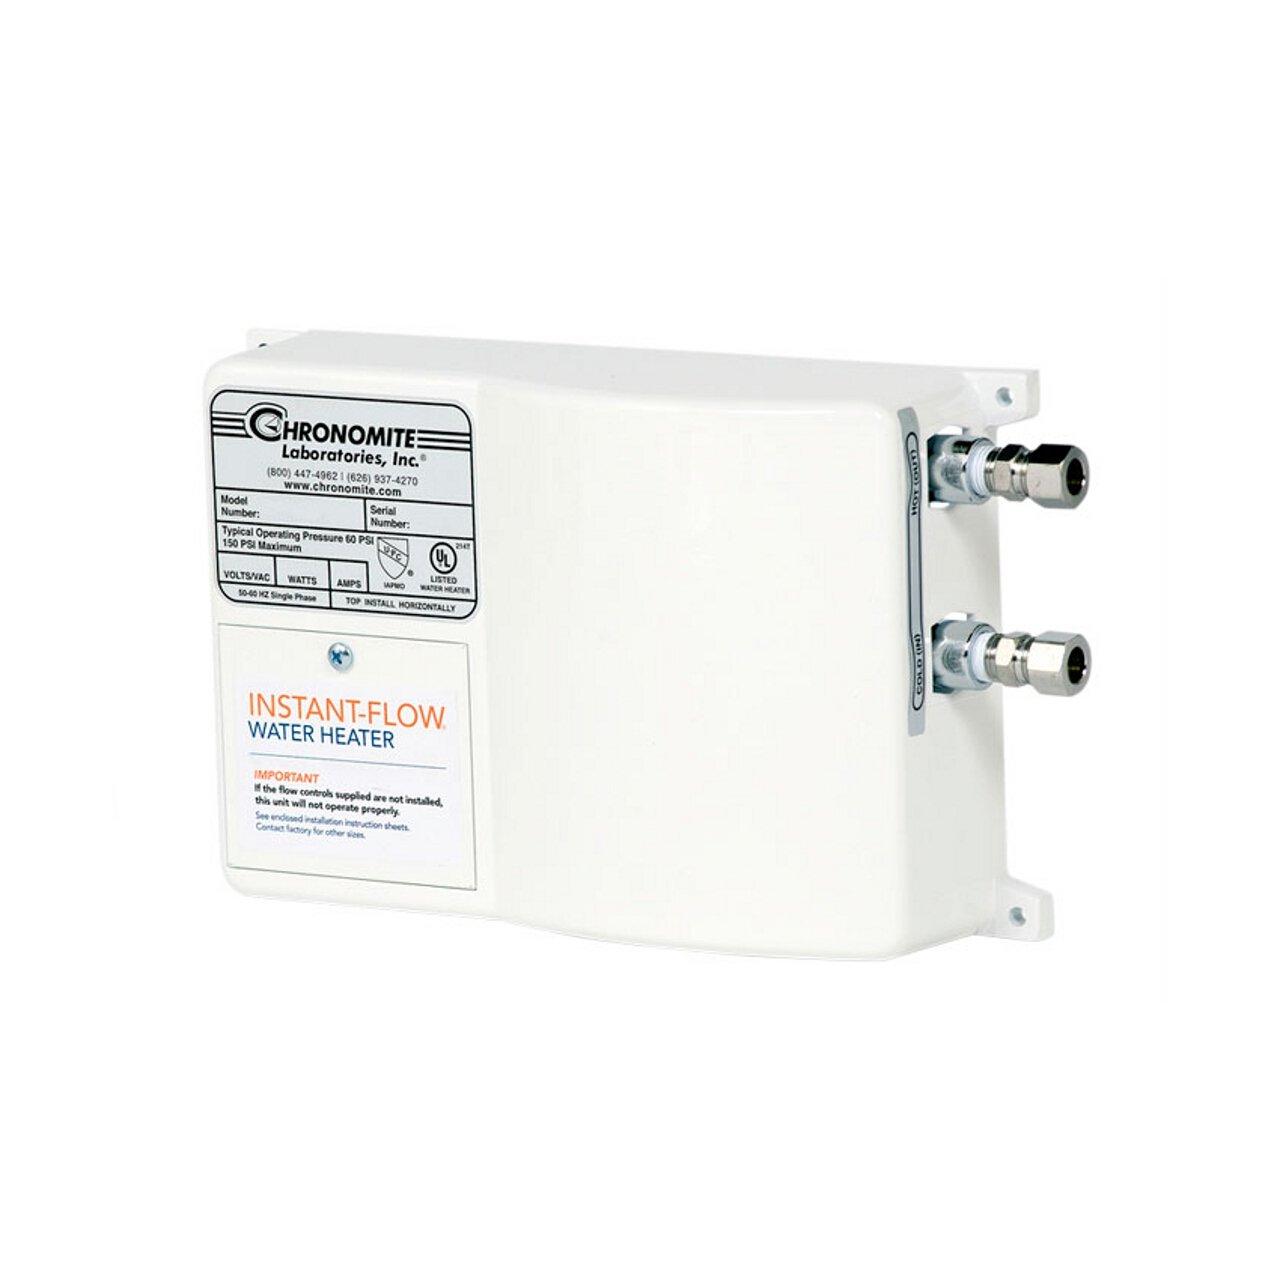 Chronomite SR-30L/120 HTR 120-Volt 30-Amp SR Series Instant-Flow Low Flow Tankless Water Heater by Chronomite